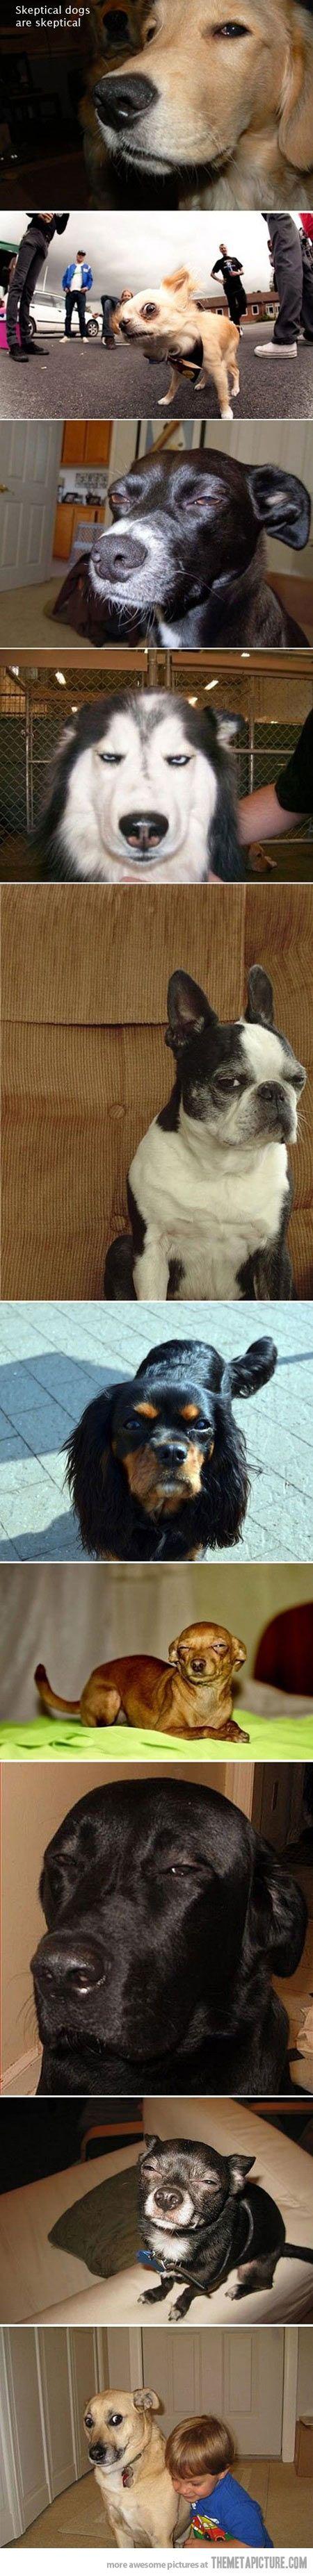 Lol love dogs